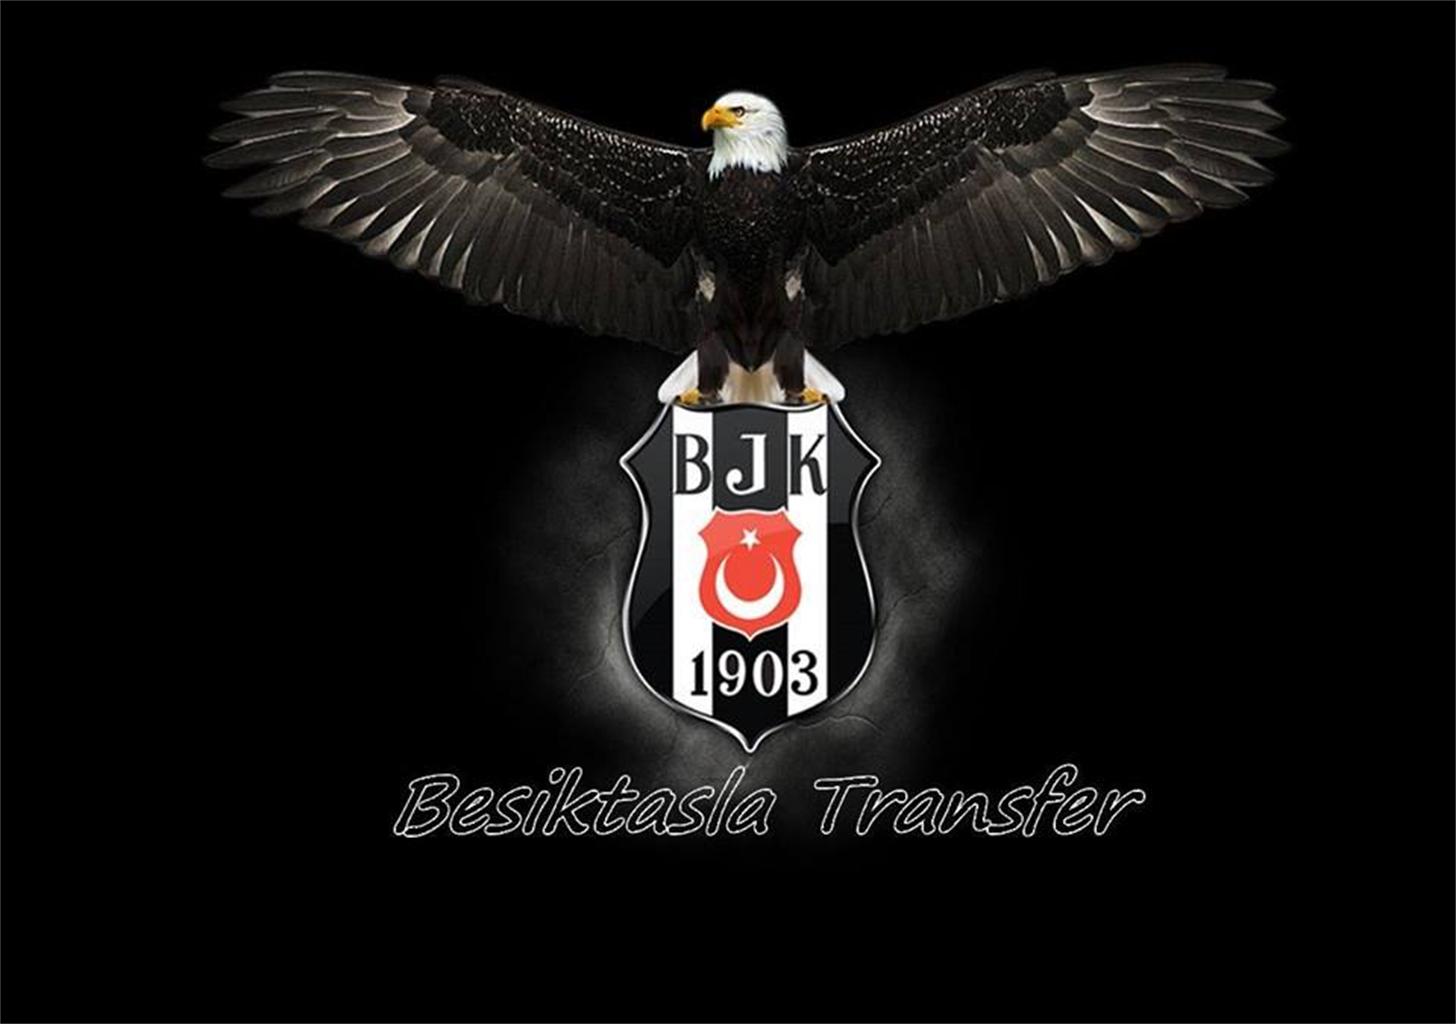 Beşiktaşla Transfer